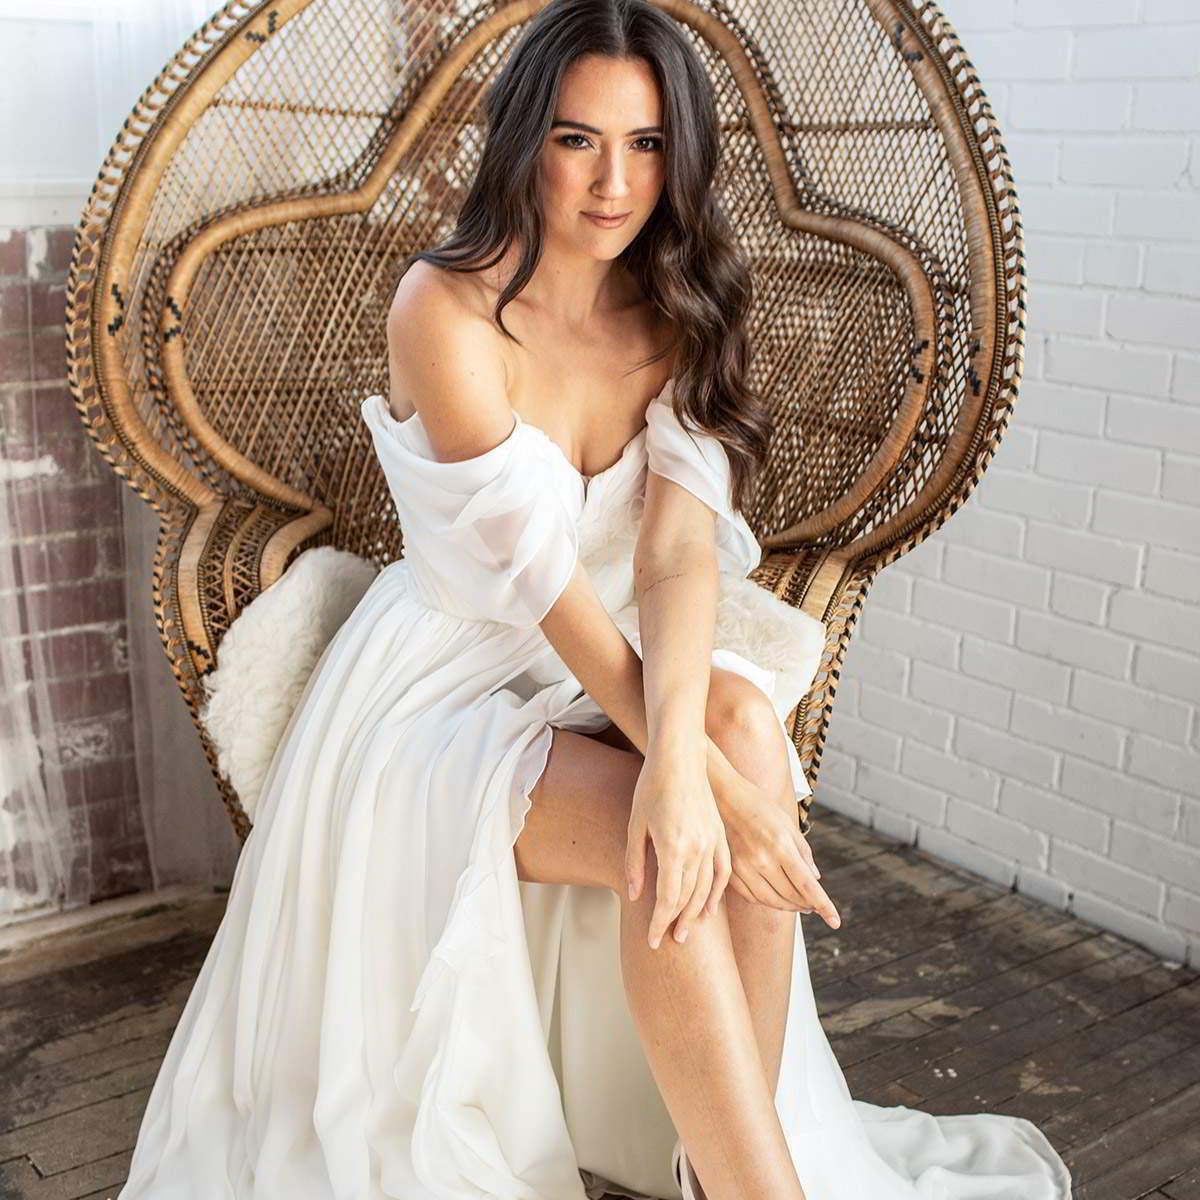 barbara kavchok fall 2020 bridal collection featured on wedding inspirasi thumbnail